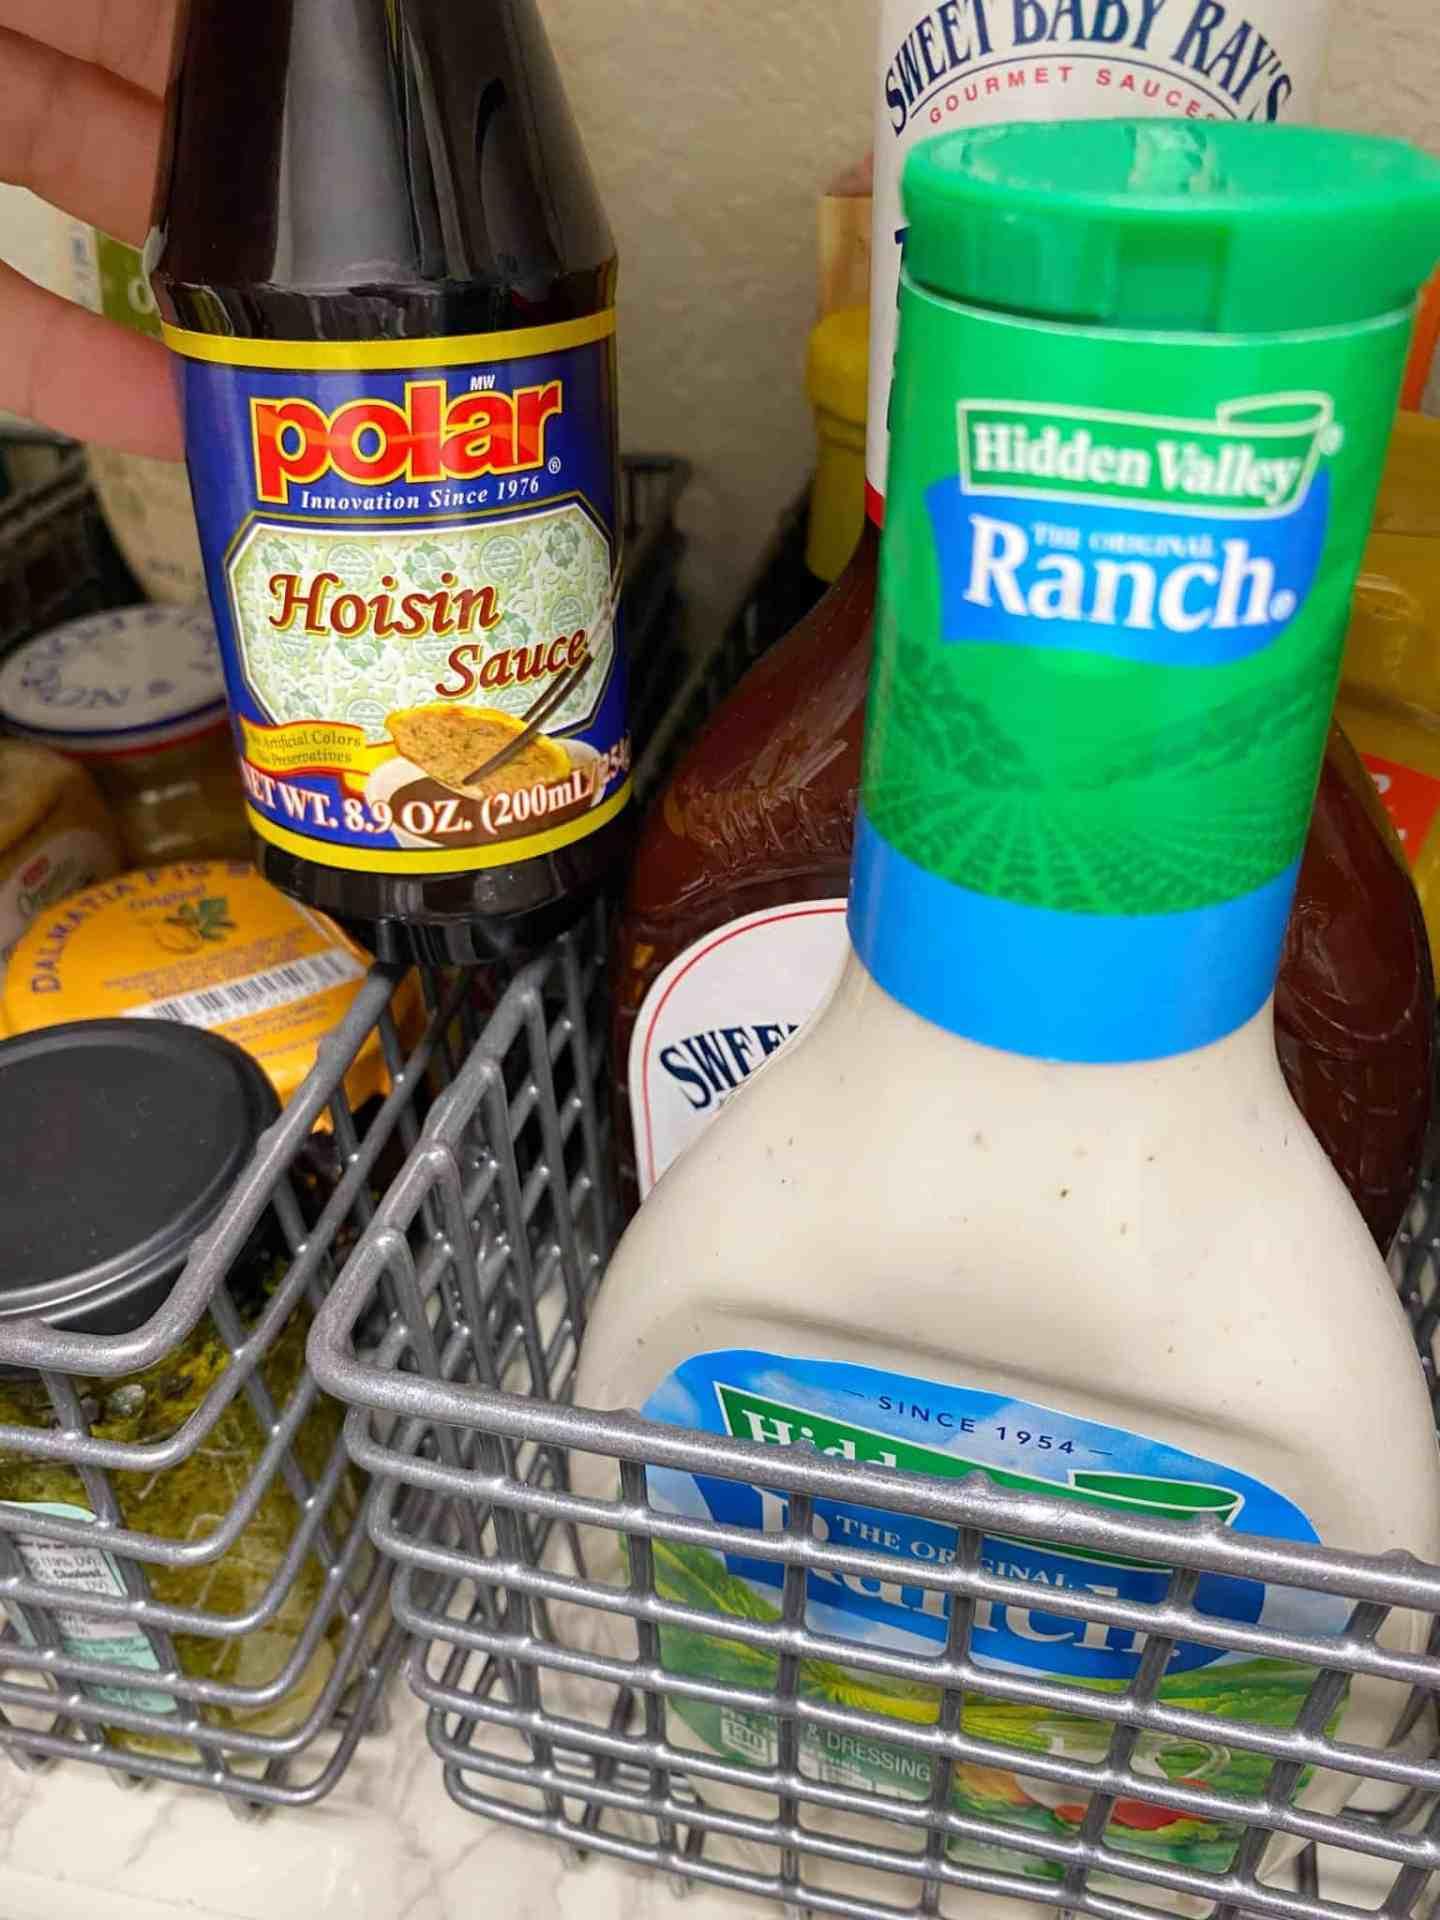 hoisin-sauce-and-ranch